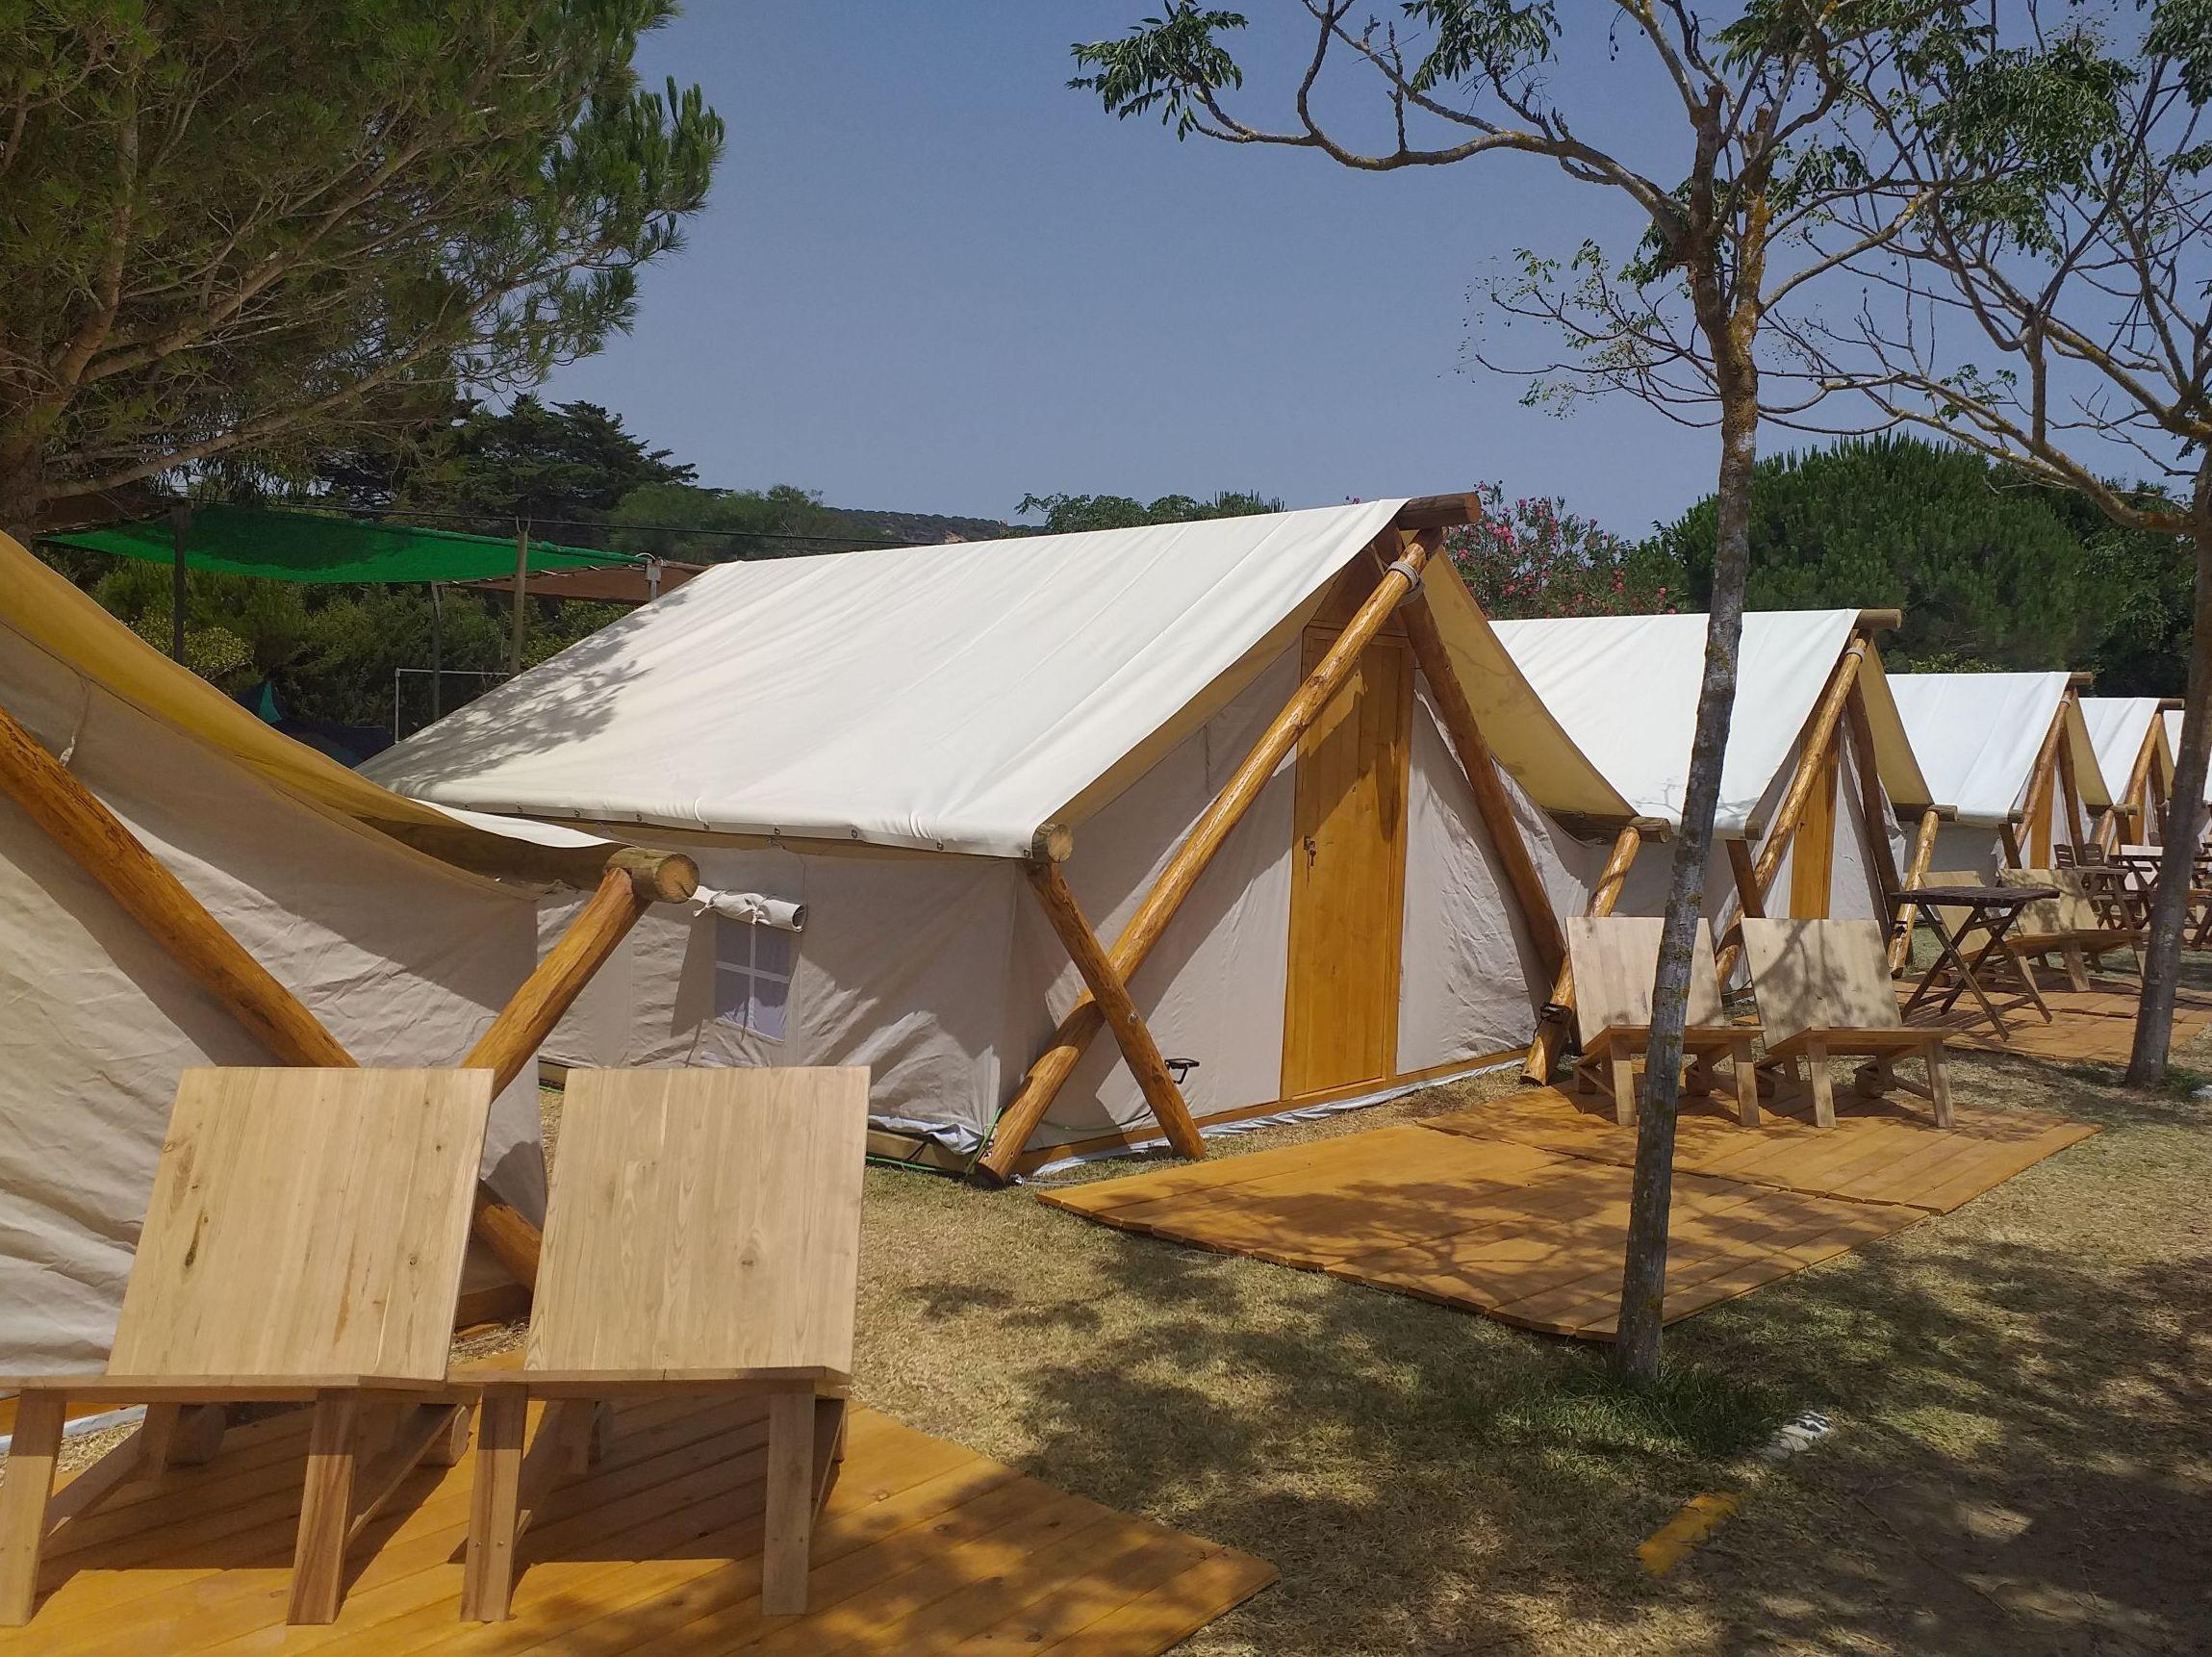 Foto 7 de Campings en Barbate | CAMPING FARO DE TRAFALGAR